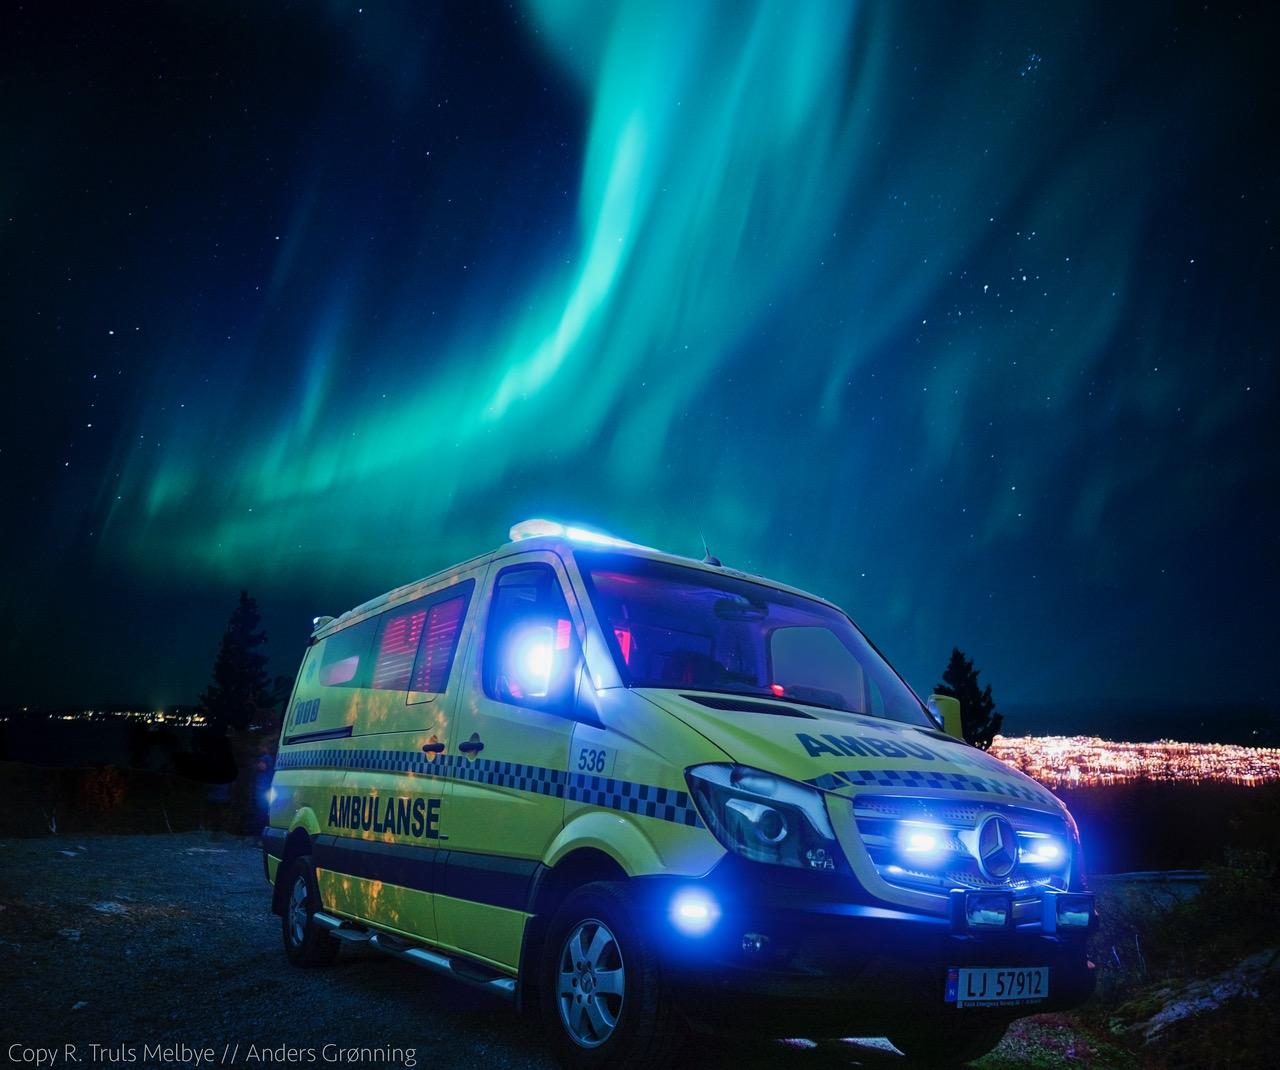 Ambulanse i nordlys. Foto: Truls Melby, komposisjon Anders Grønning